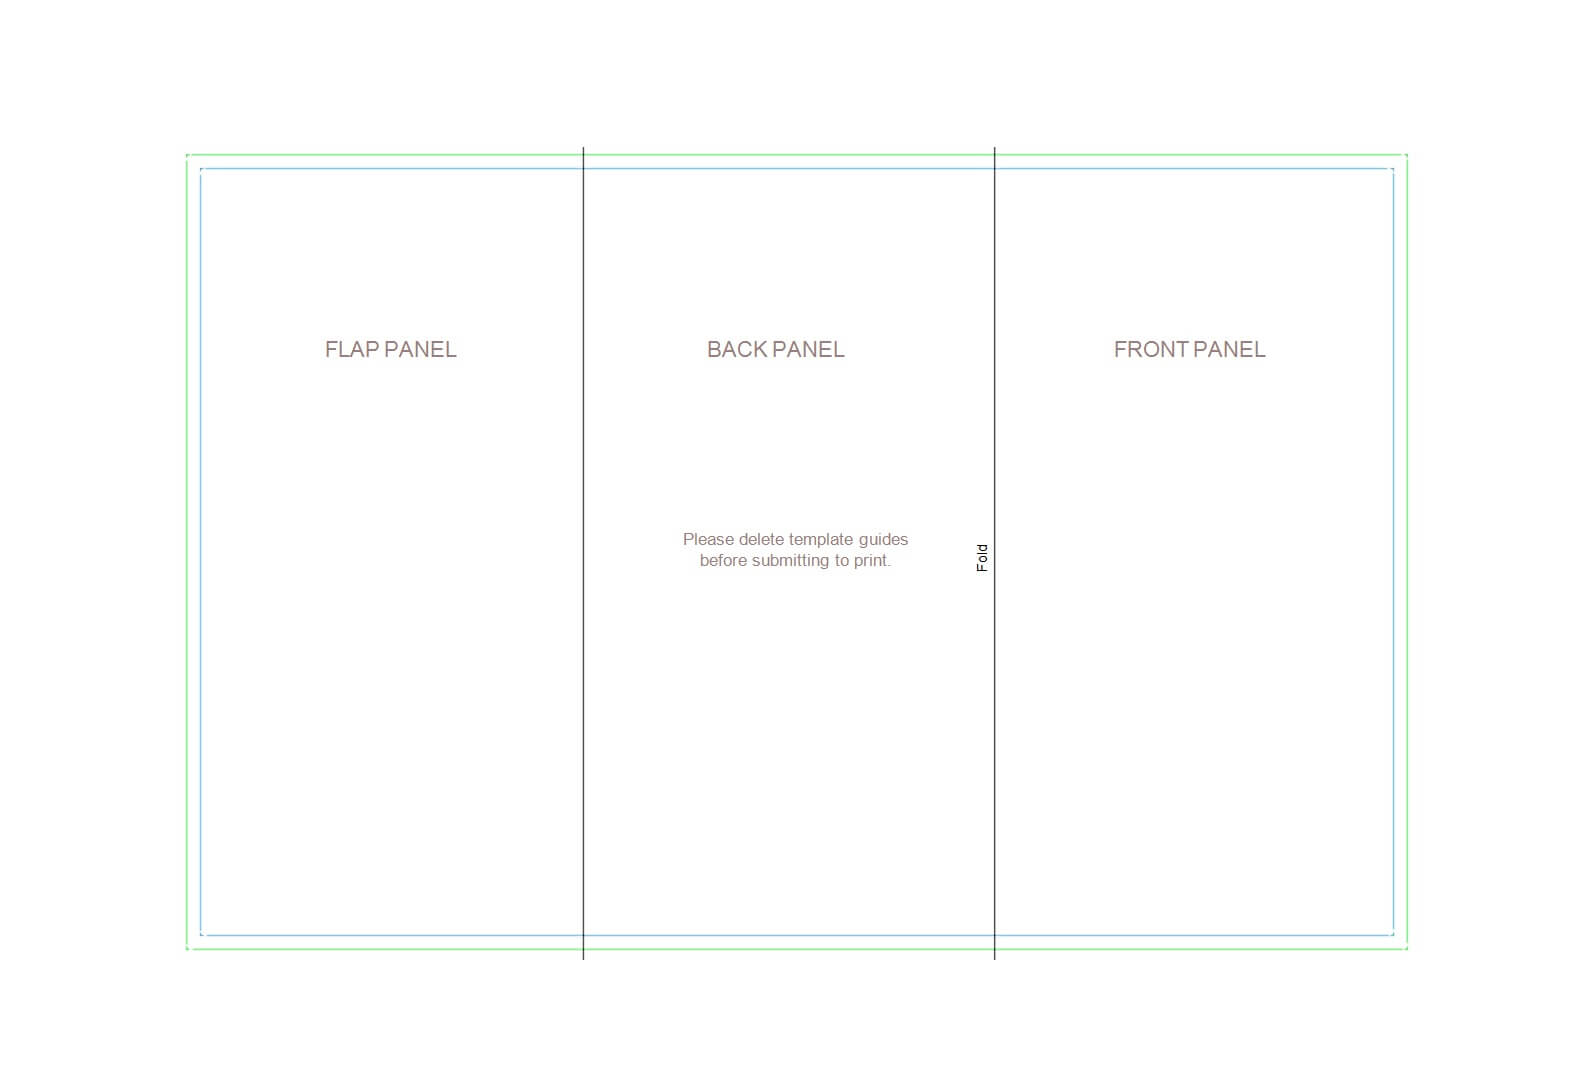 50 Free Pamphlet Templates [Word / Google Docs] ᐅ Template Lab inside Brochure Template For Google Docs